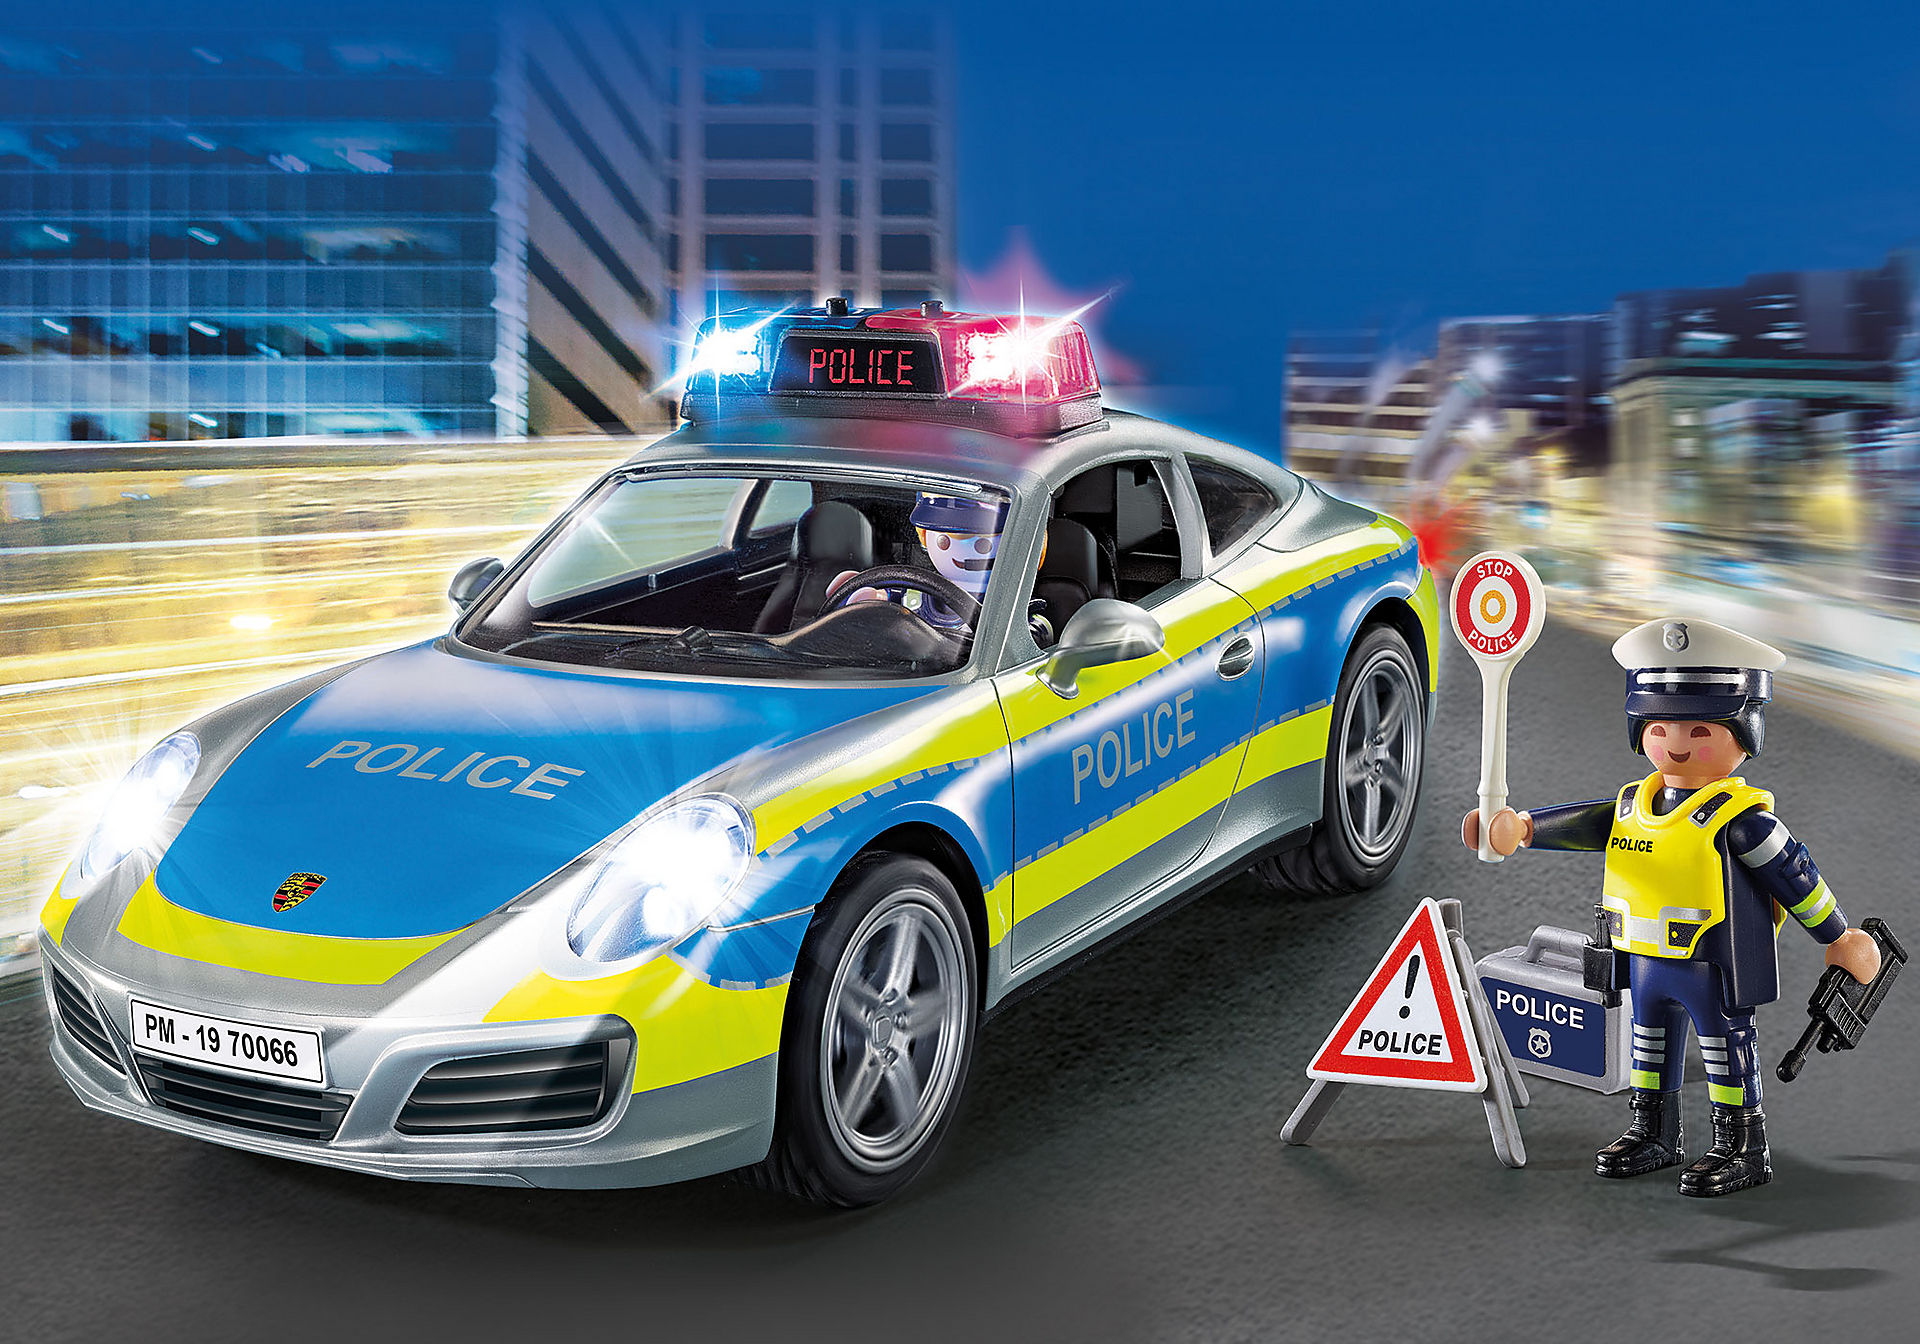 70066 Porsche 911 Carrera 4S Policja zoom image1